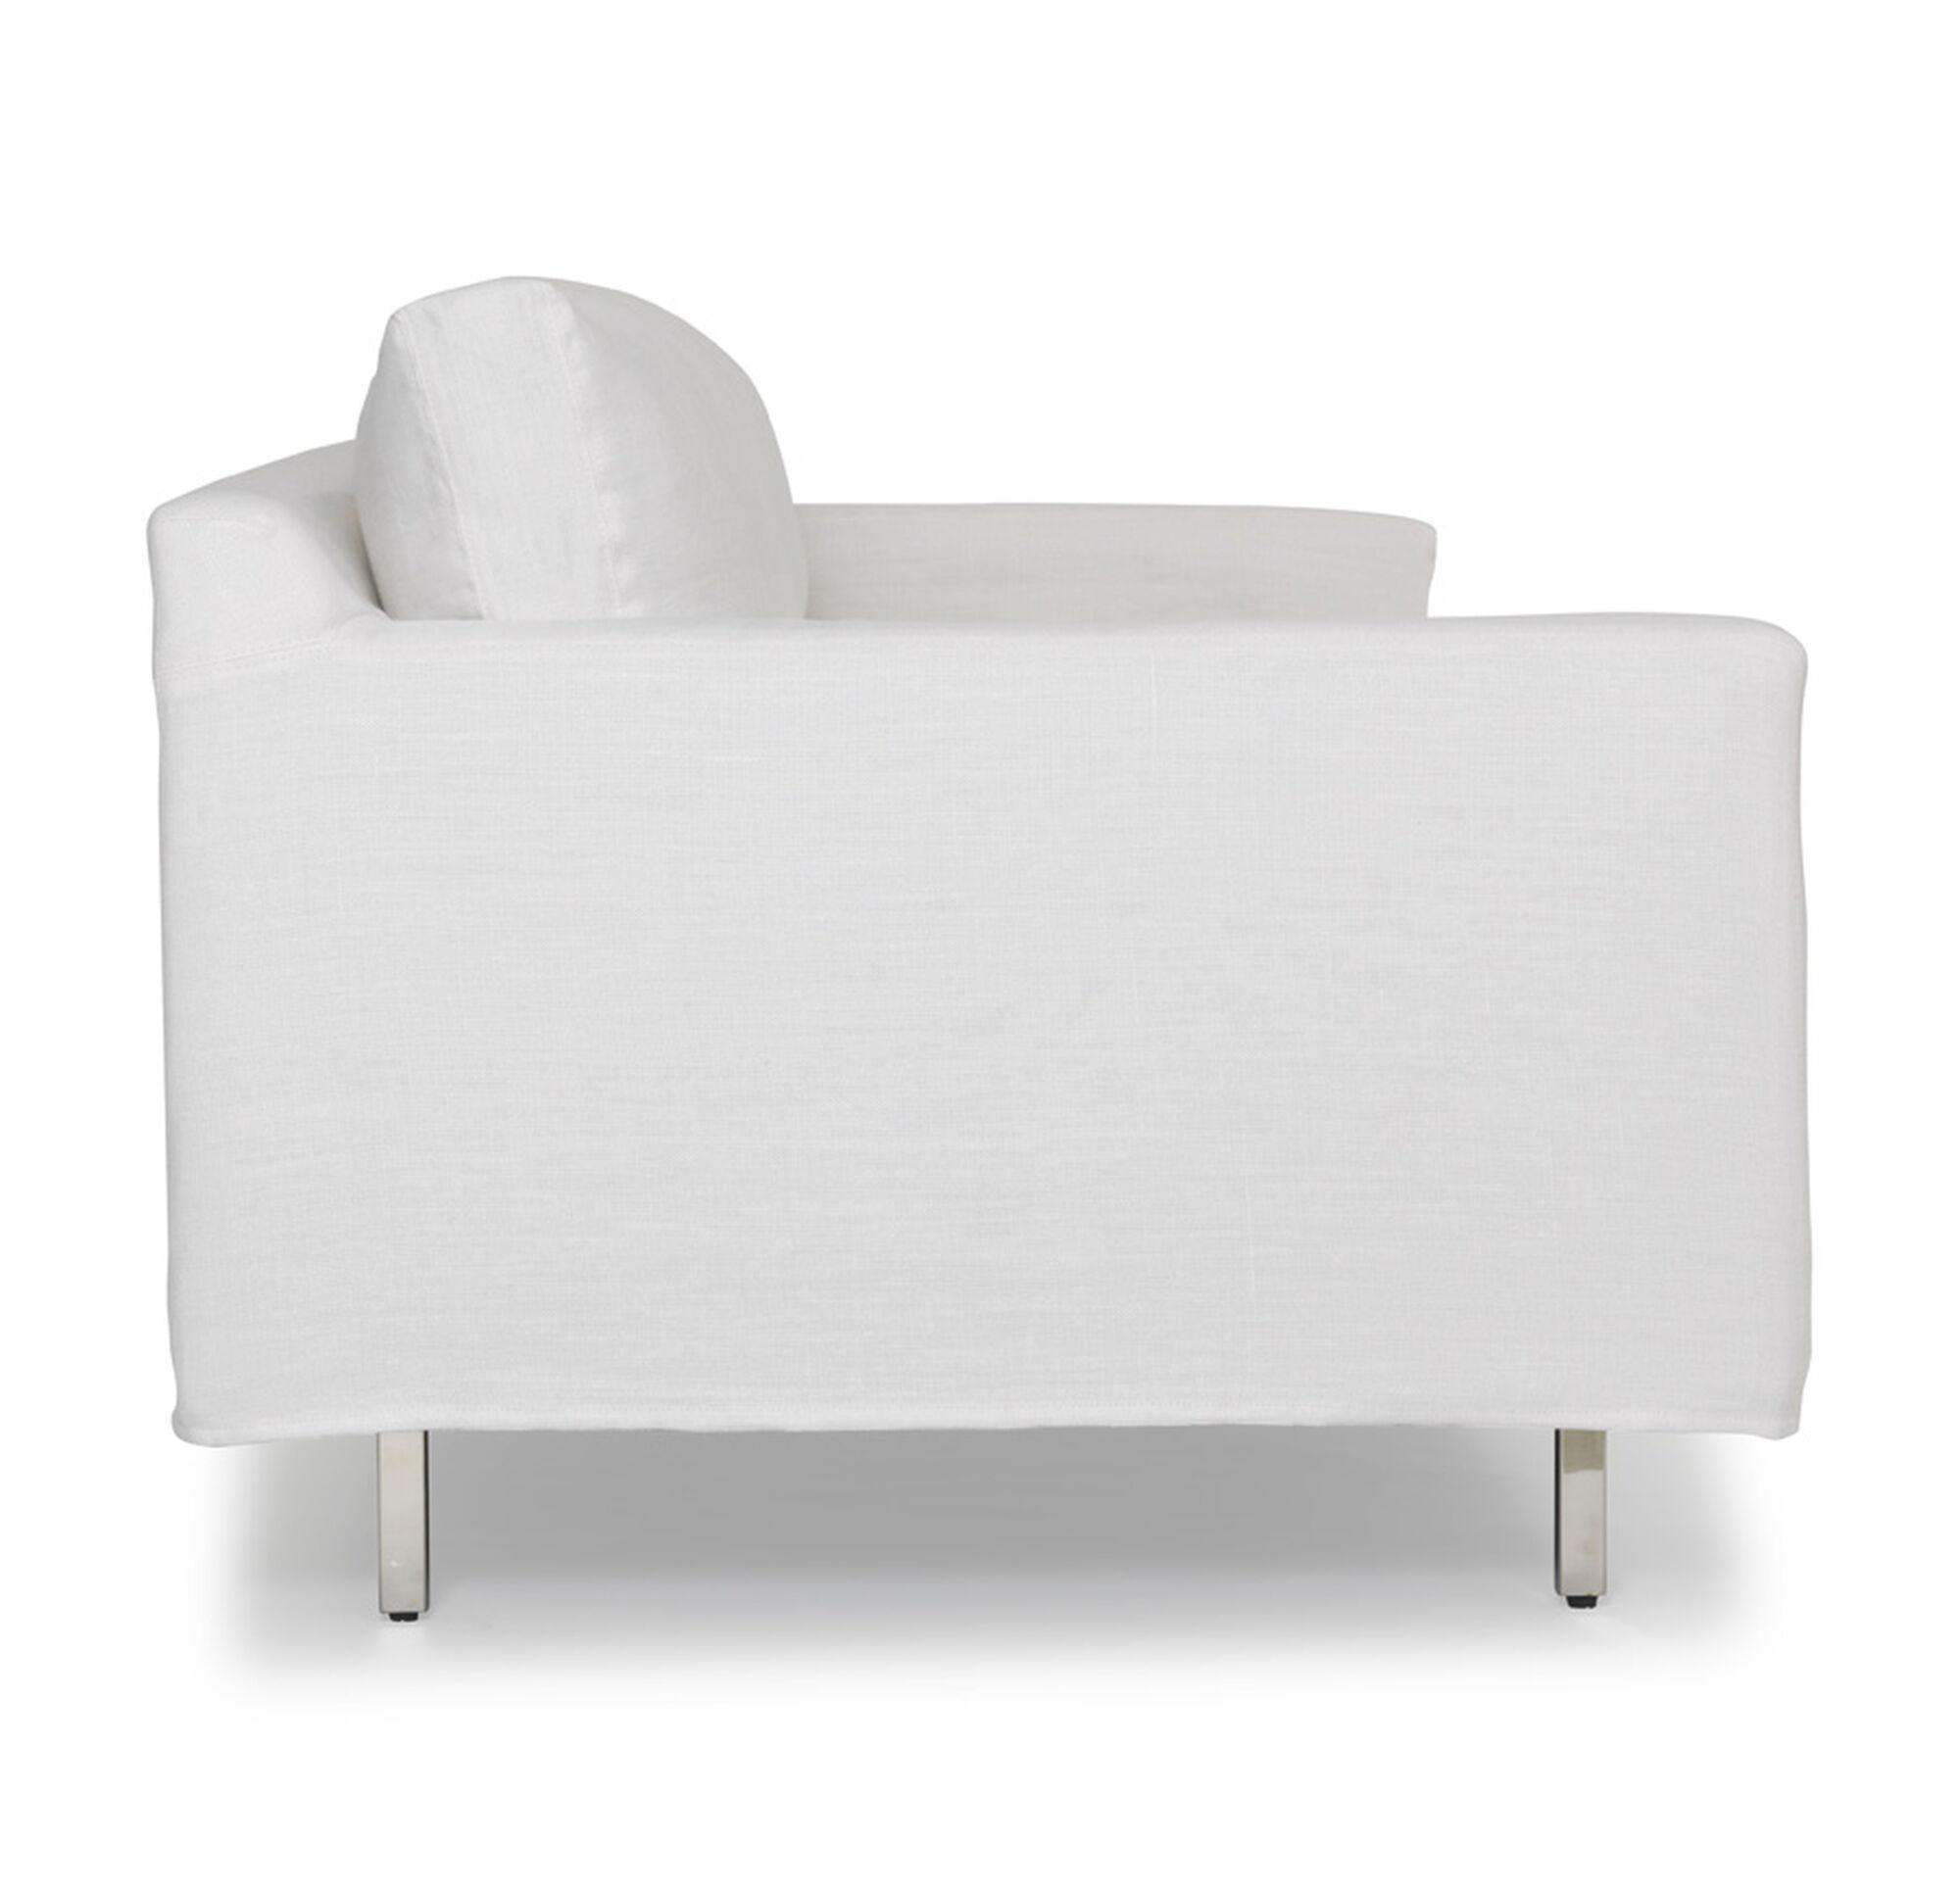 chatham sw sq slip slipcover furniture sofa products jennifer sleeper